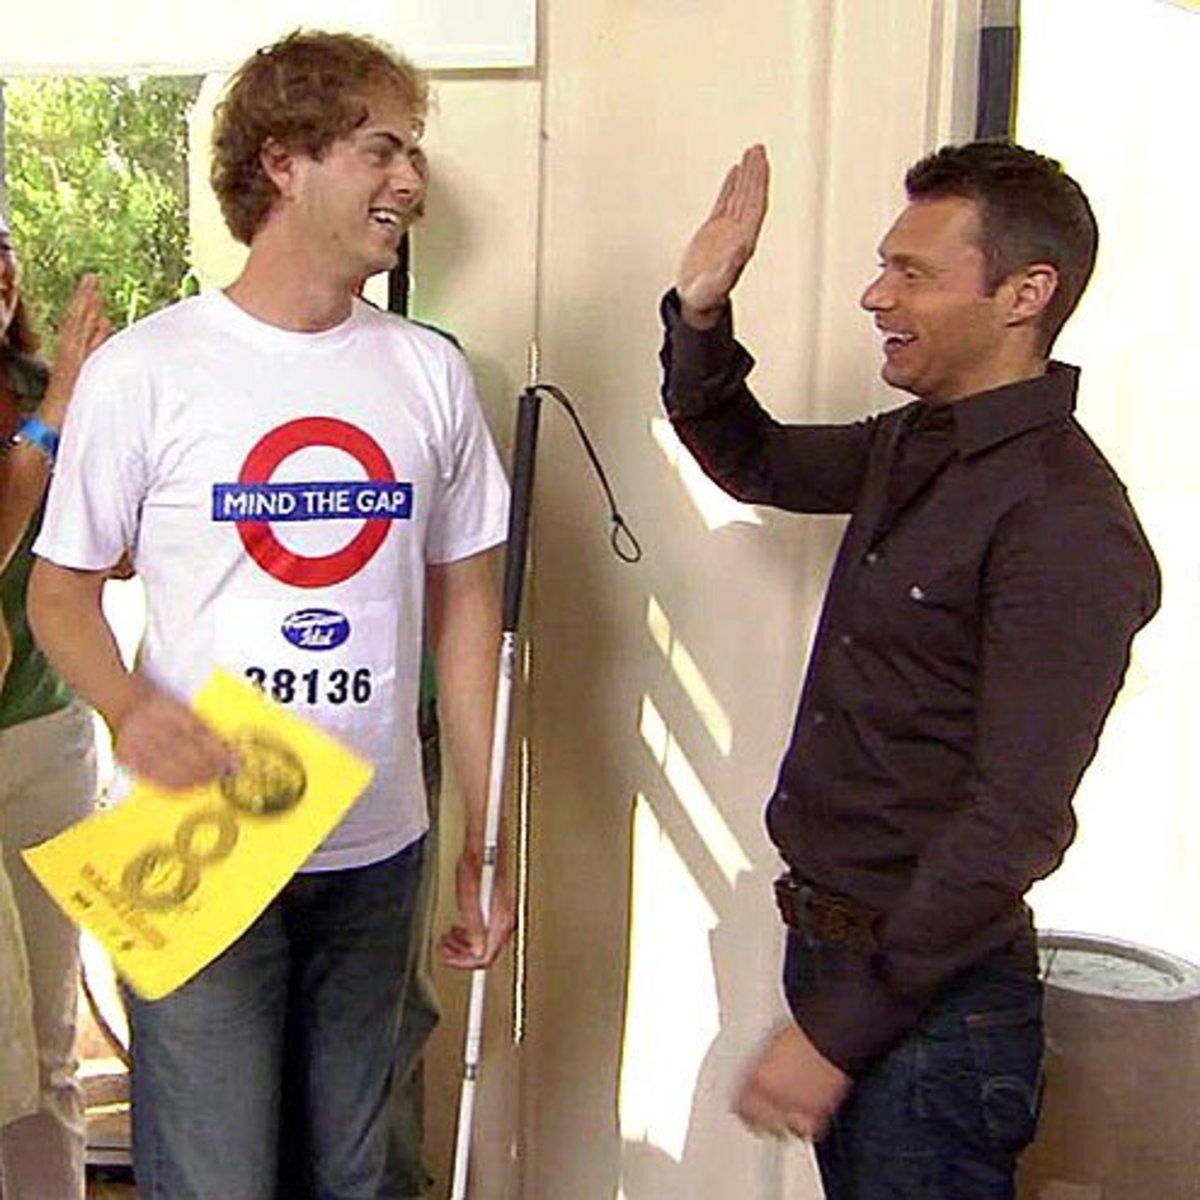 Ryan Seacrest attempts to high-five Scott MacIntyre during American Idol's 8th season.